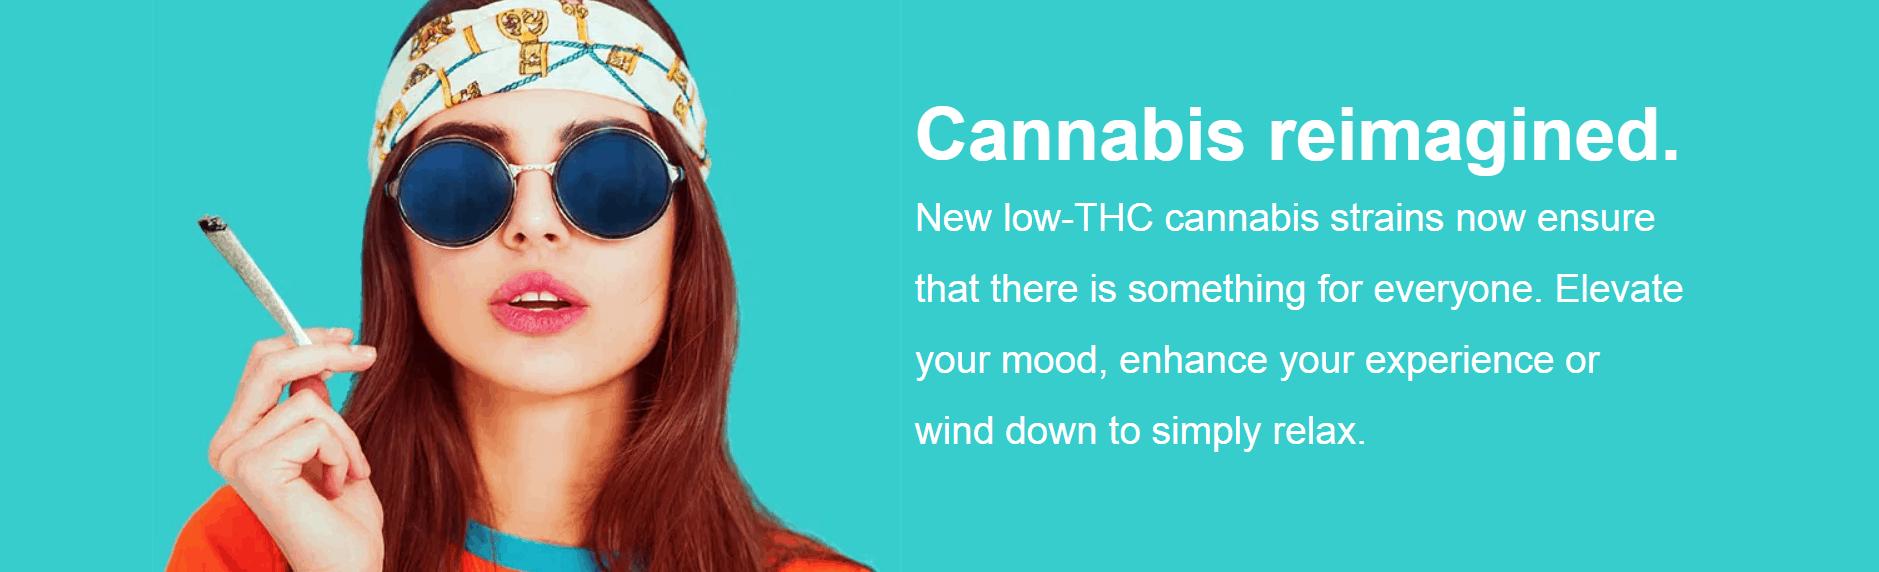 Canna Flower CBD Coupons Cannabis Reimagined